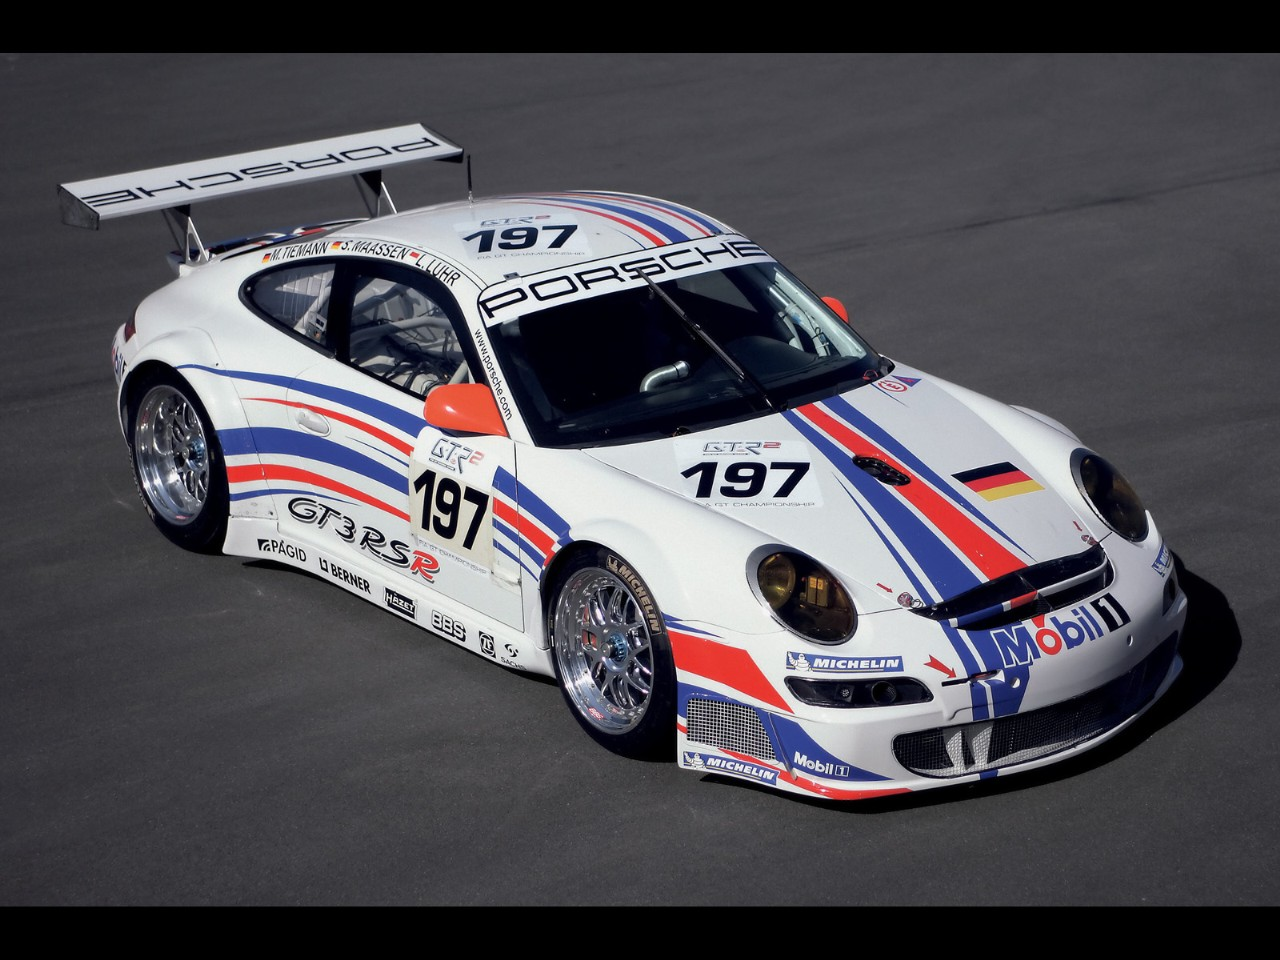 2007 Porsche 911 Gt3 Rsr Image